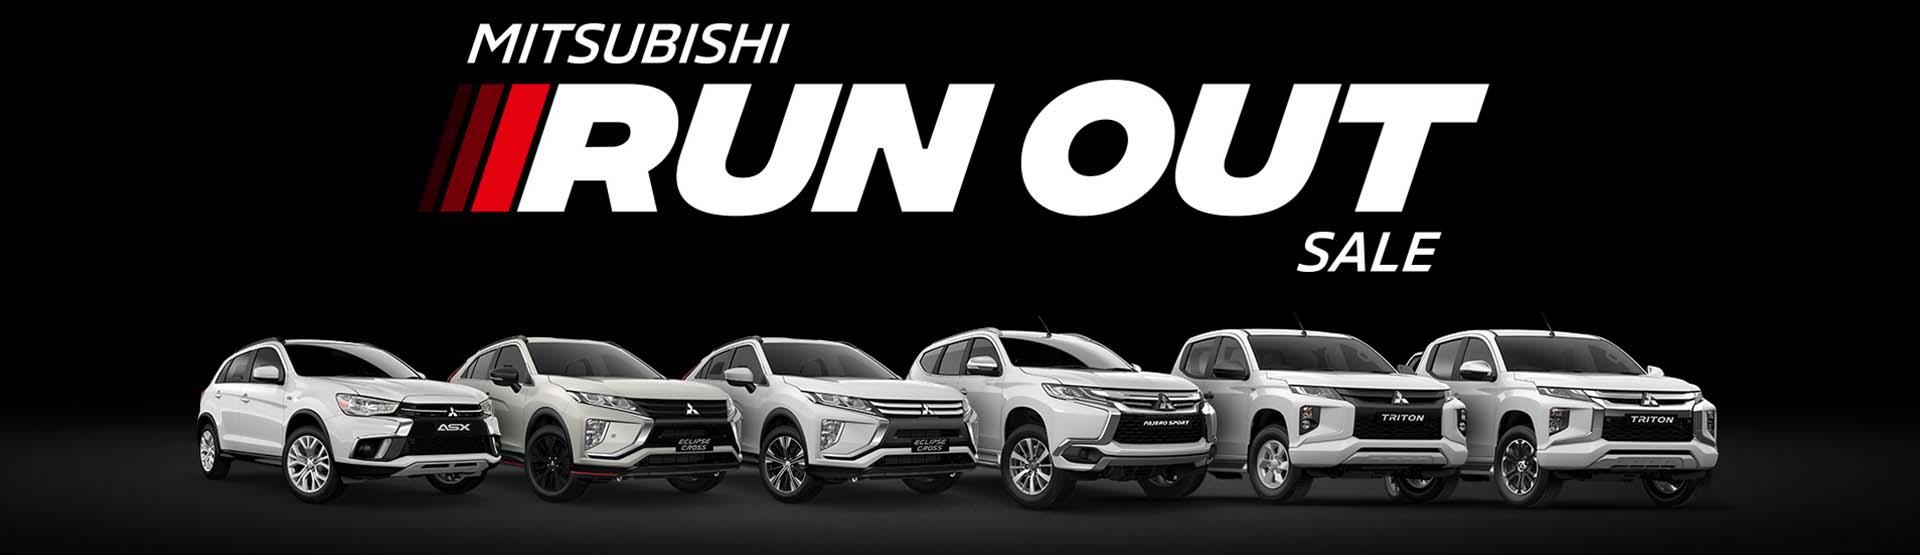 Mitsubishi Dealer Wollongong - Gateway Mitsubishi